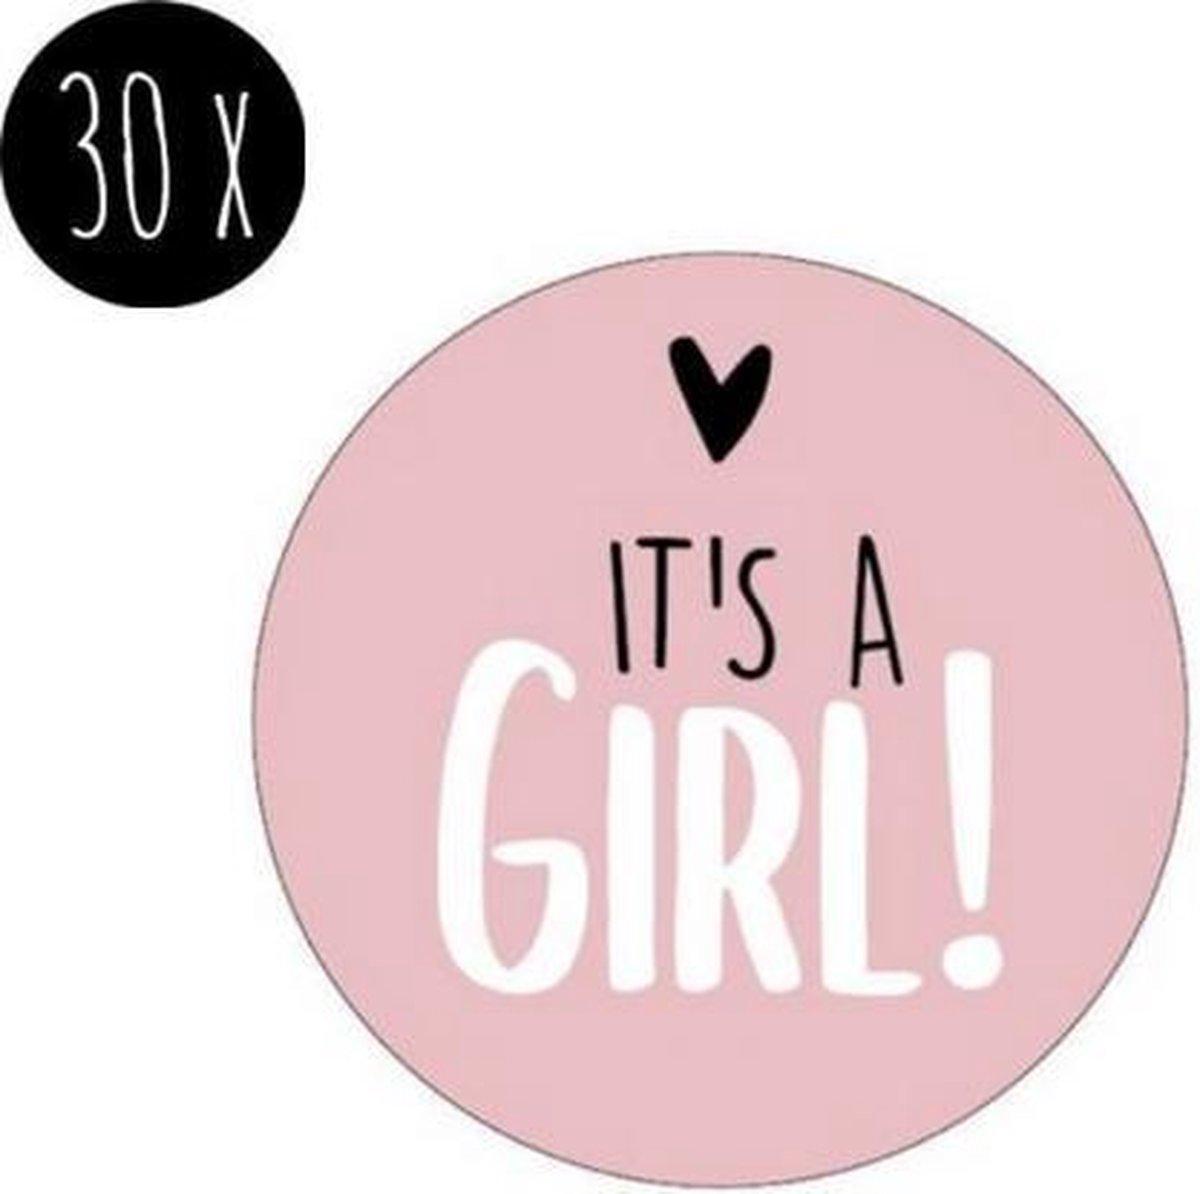 30x Sluitsticker It's a Girl! | Roze | 40 mm | Geboorte Sticker | Sluitzegel | Sticker Geboortekaart | Baby nieuws | Zwangerschap |Luxe Sluitzegel